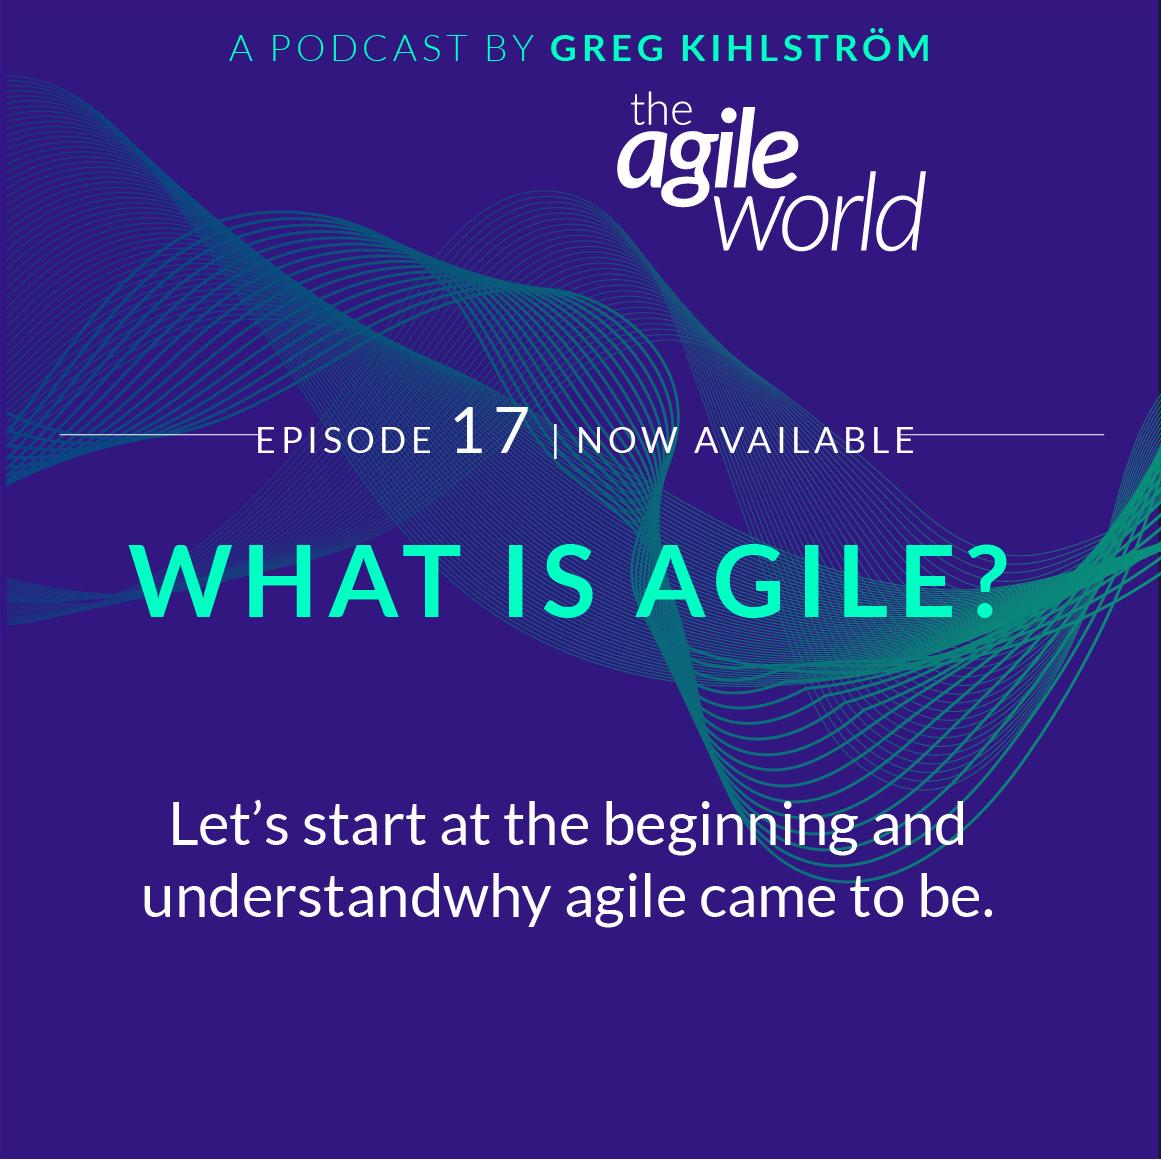 TheAgileWorld-Episode-17-Greg-Kihlstrom.png